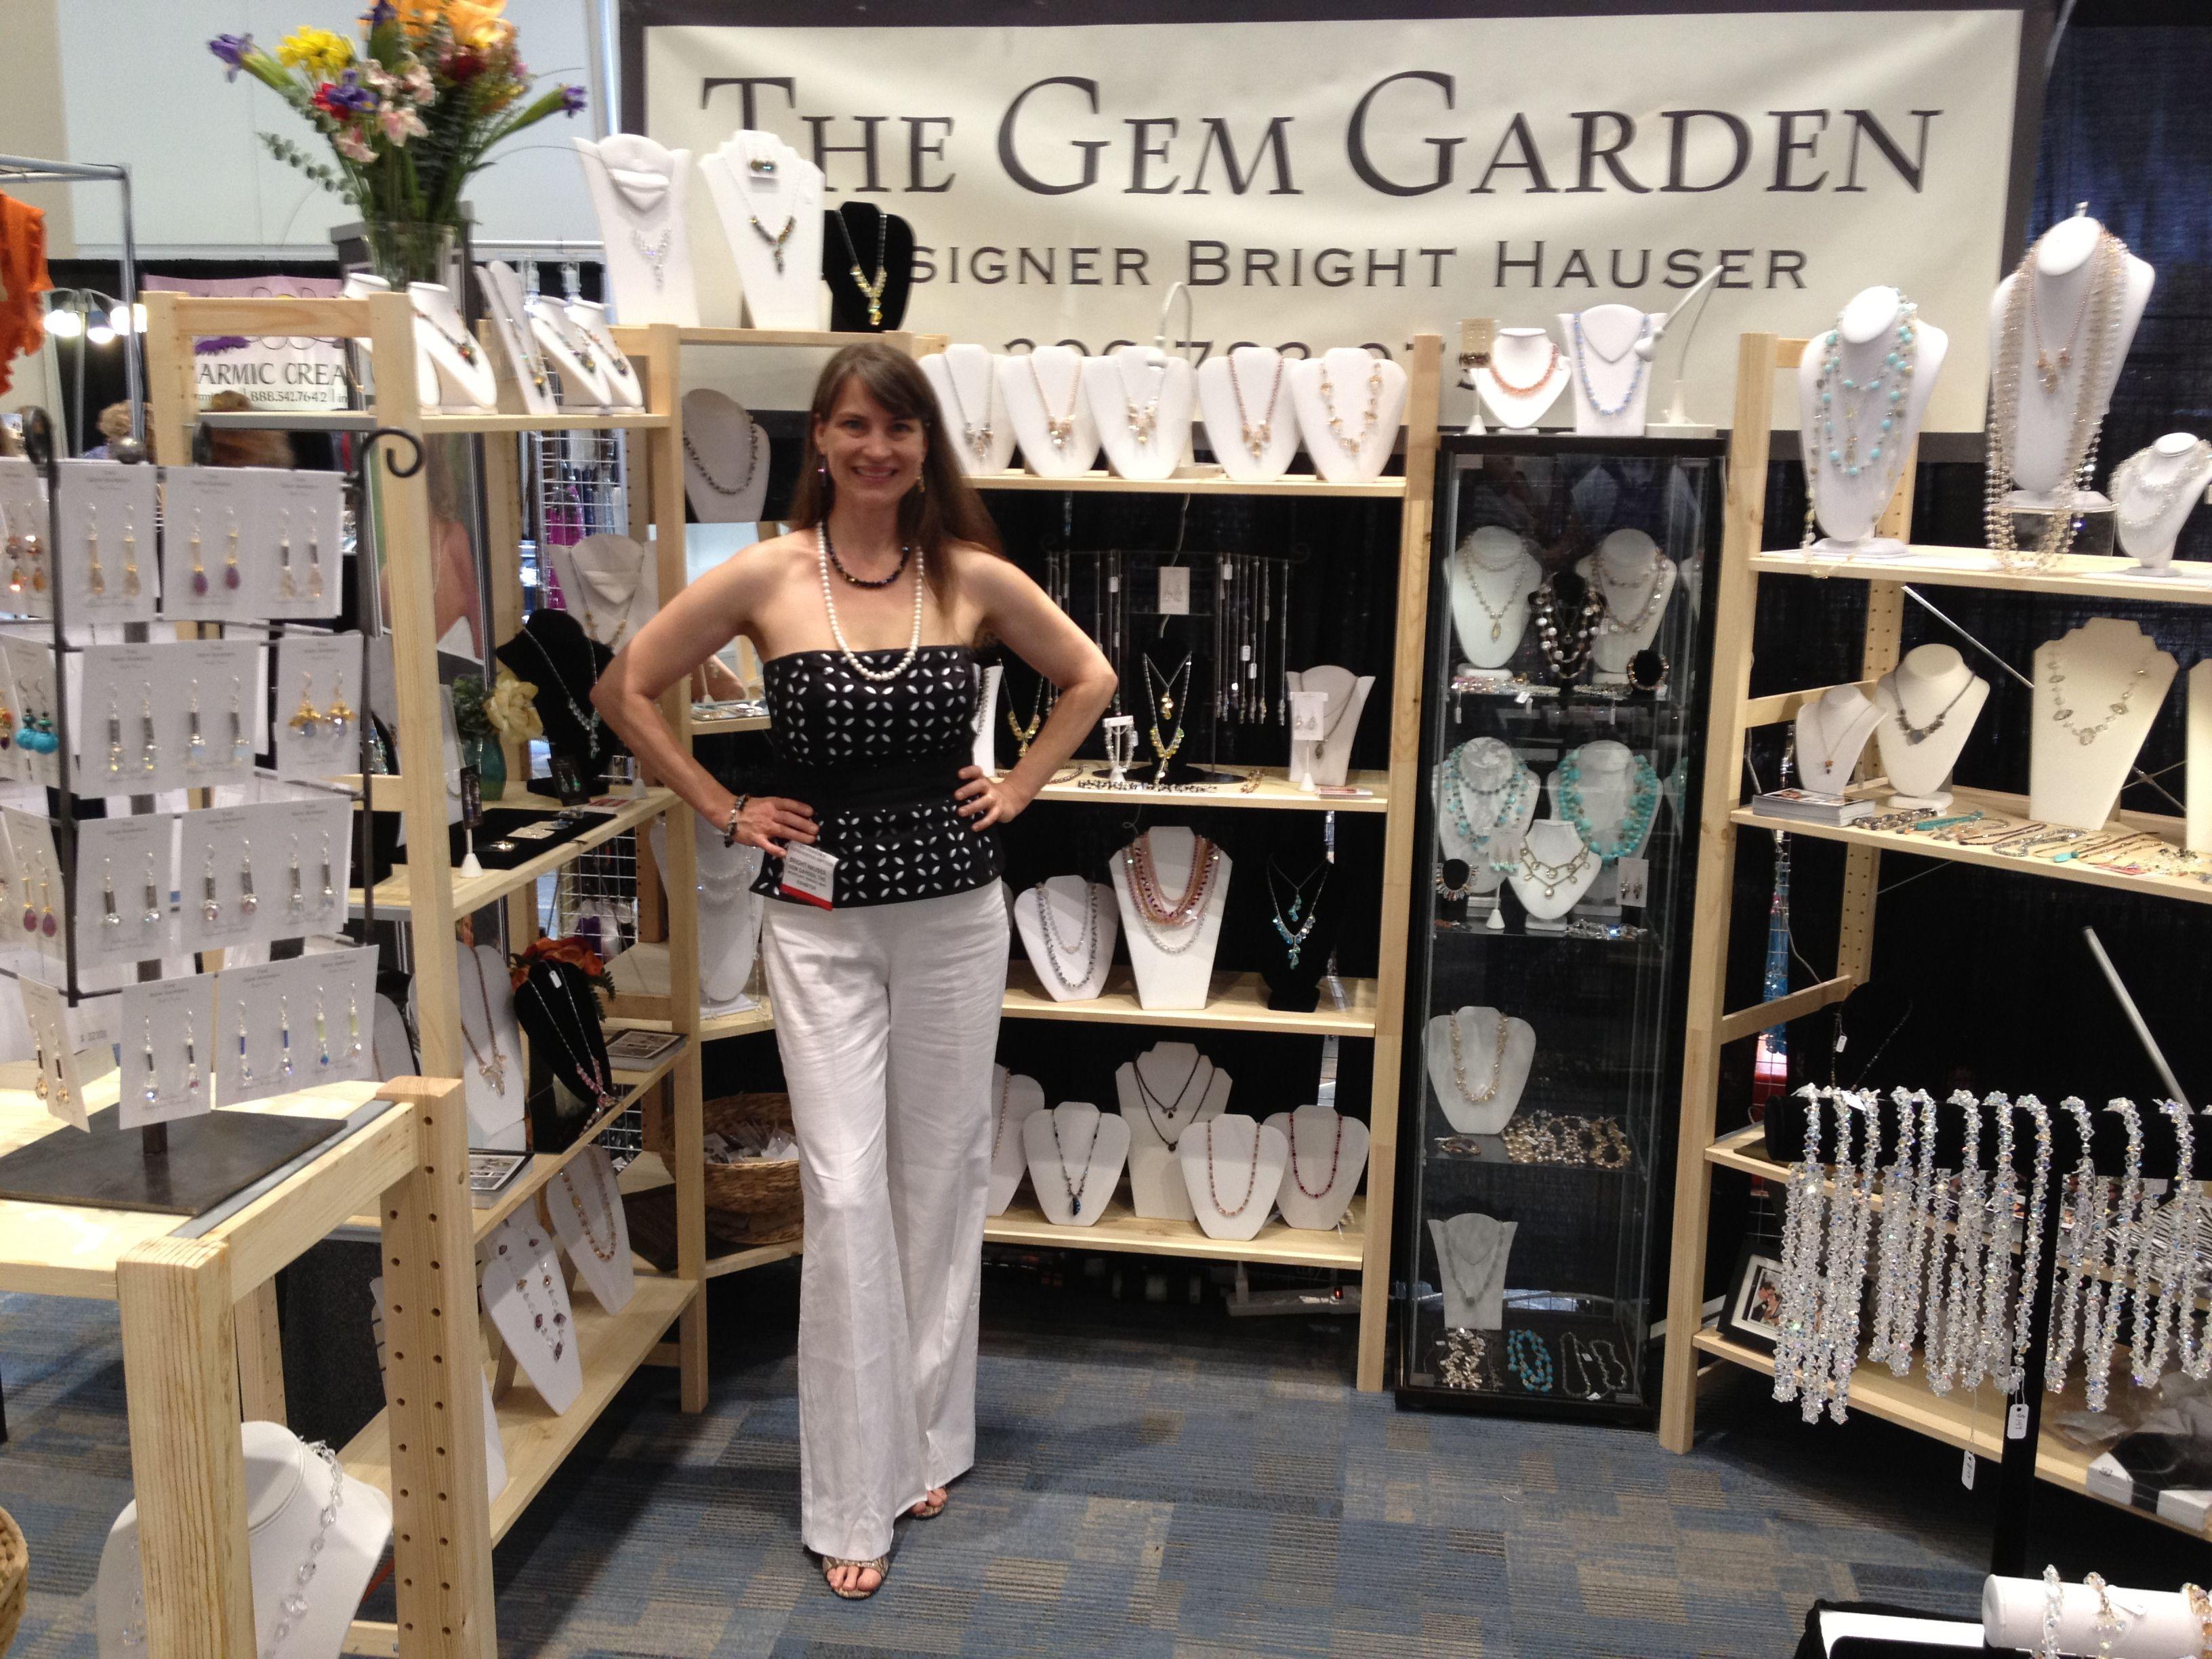 The Gem Garden designer Bright Hauser.  San Francisco,Gift and Accessories show.